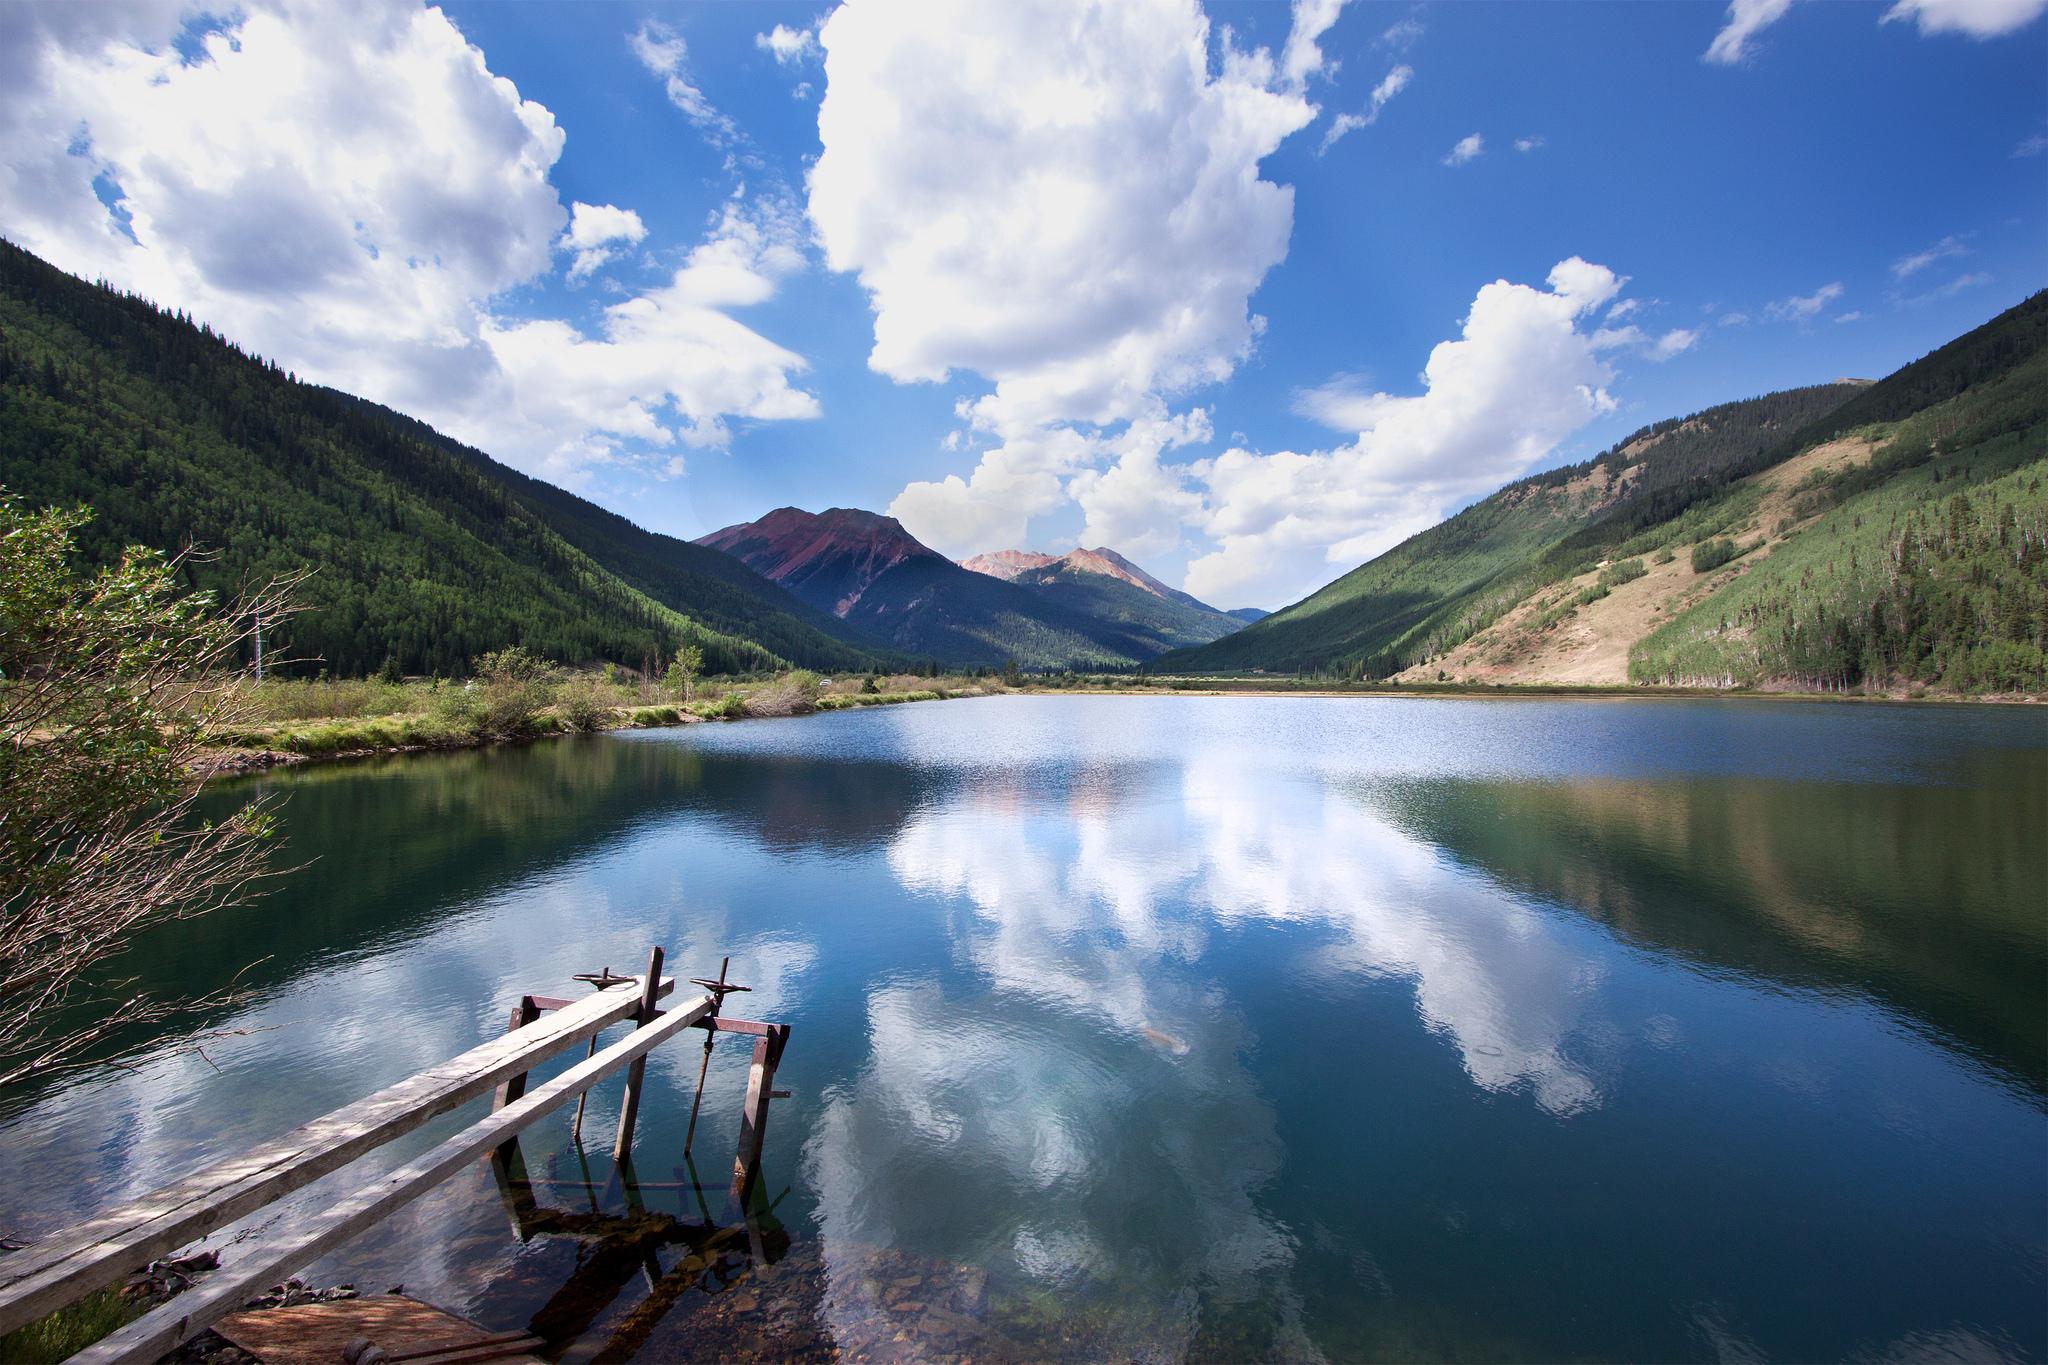 """Crystal Lake Reflection"" cc image courtesy of alan Stark on FLICKR"